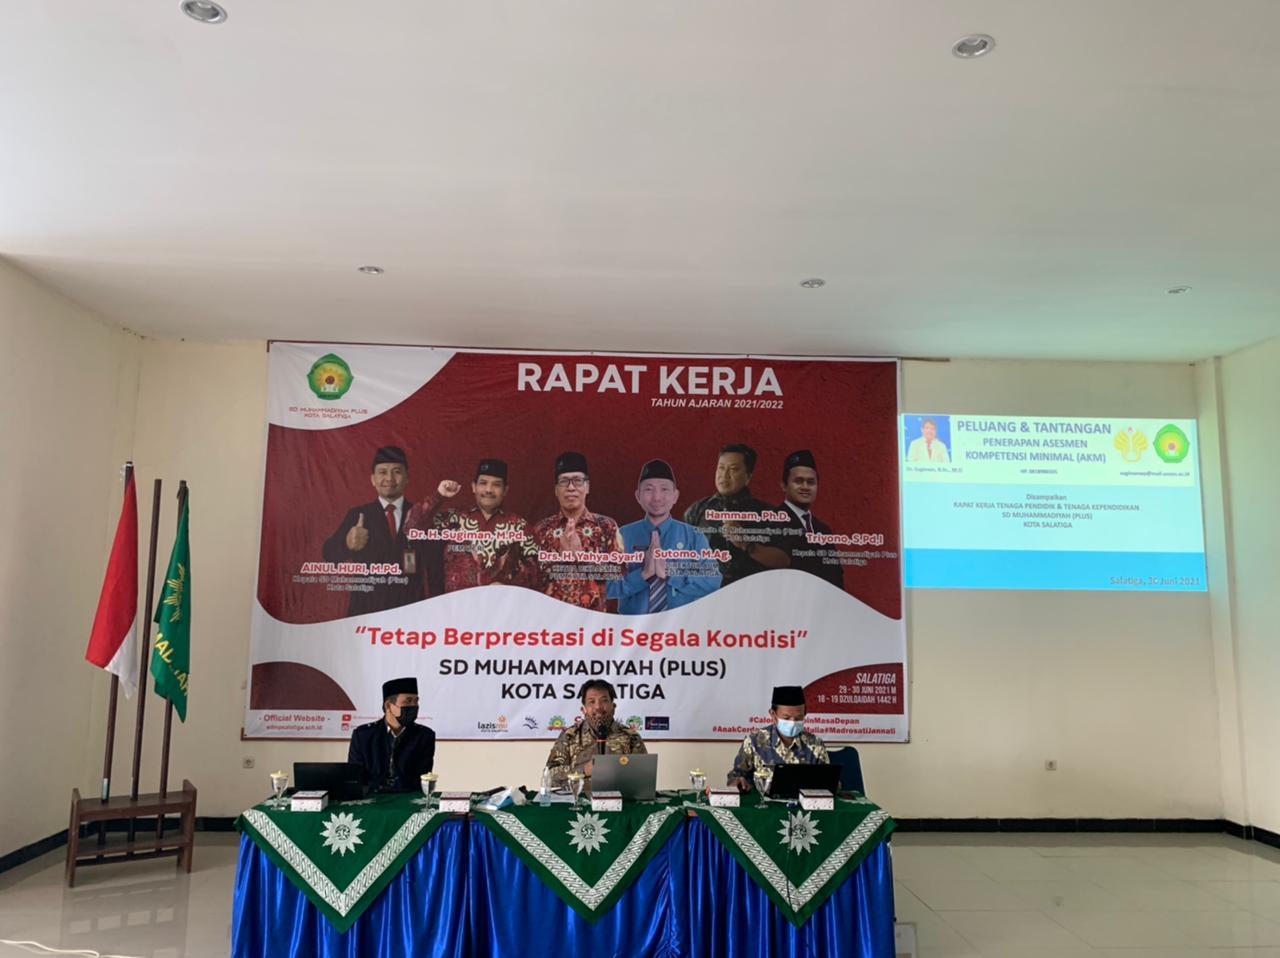 rapat kerja sd muhammadiyah plus salatiga tahun ajaran 2020/2021